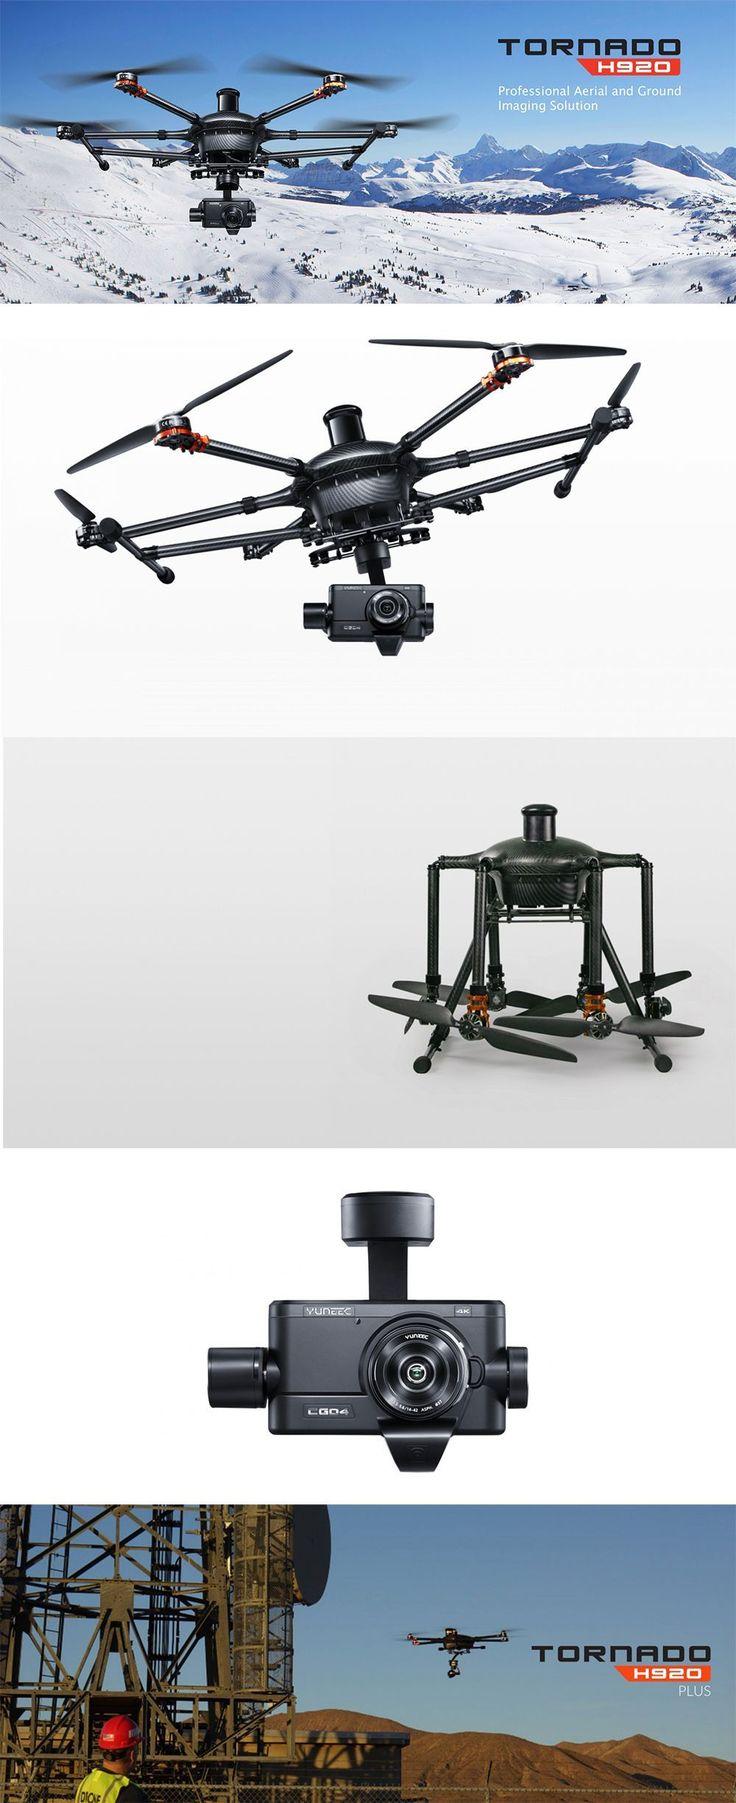 YUNEEC TORNADO H920 | drone | hexacopter | yuneec tornado | yuneec | drone with camera | drone camera | drones for sale | dron | camera drone | best drones | rc drone | quadcopter with camera | best drones with camera | rc quadcopter | gopro drone | best camera drone | best quadcopter | quadcopter drone | quadcopter |